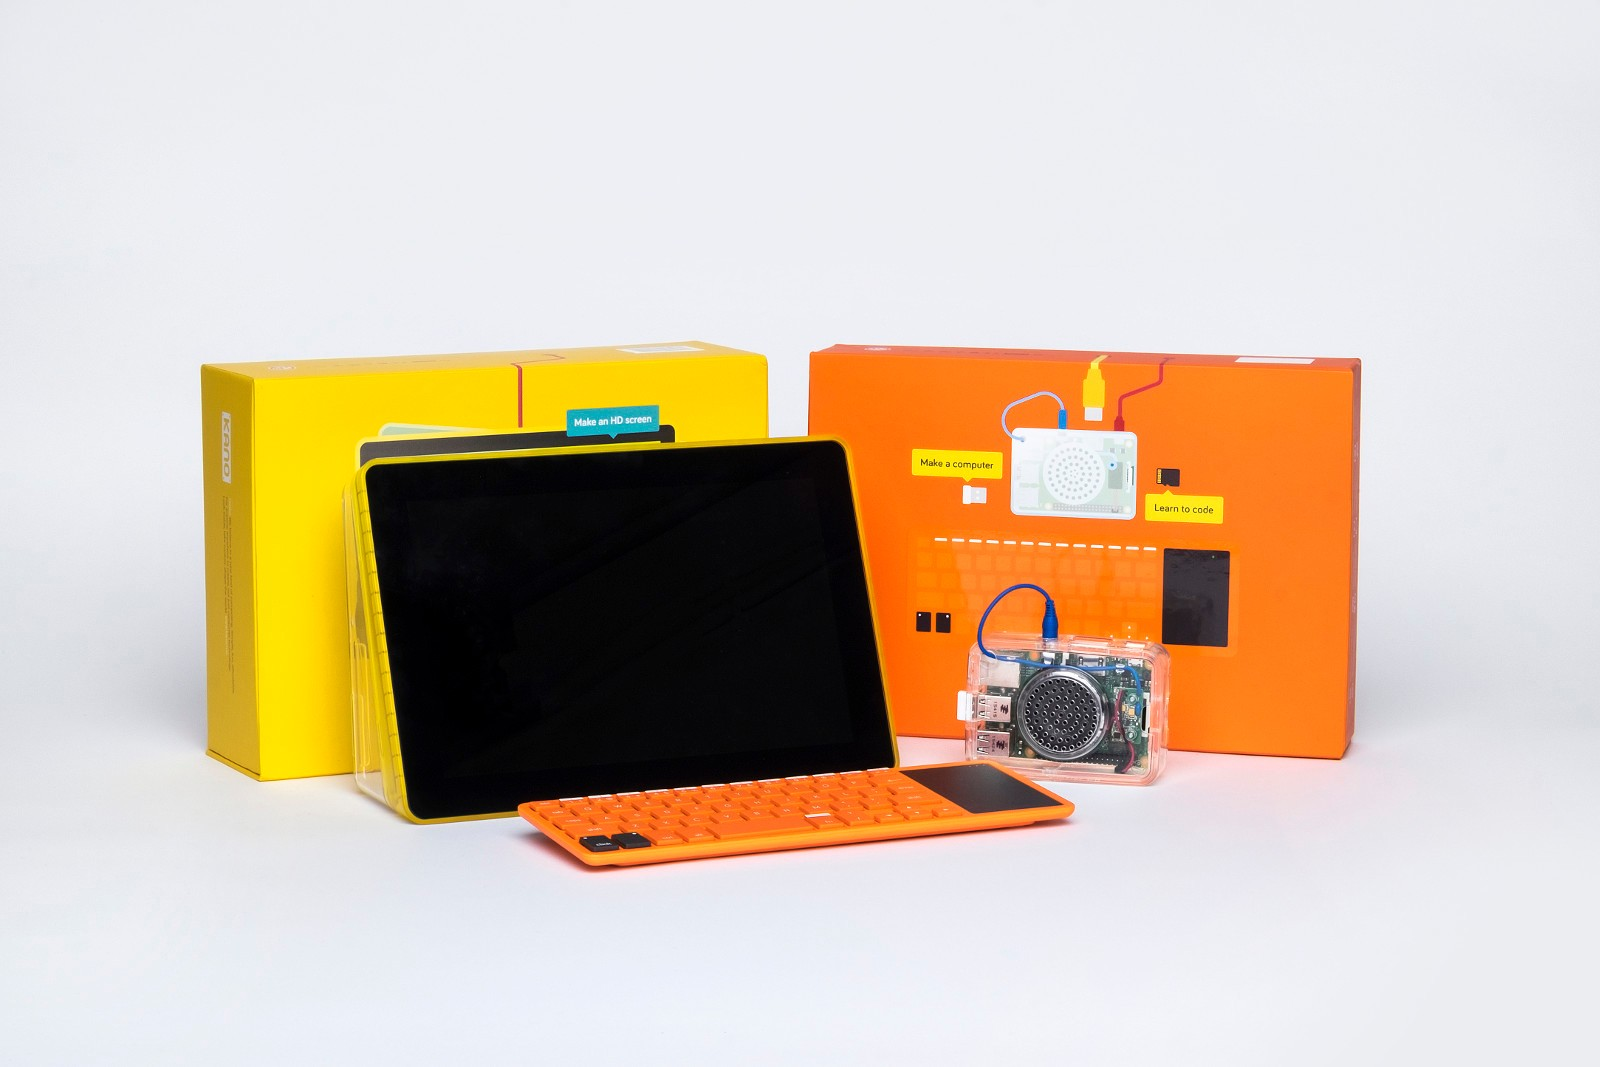 KANO-computer-kit-bundle-boxes